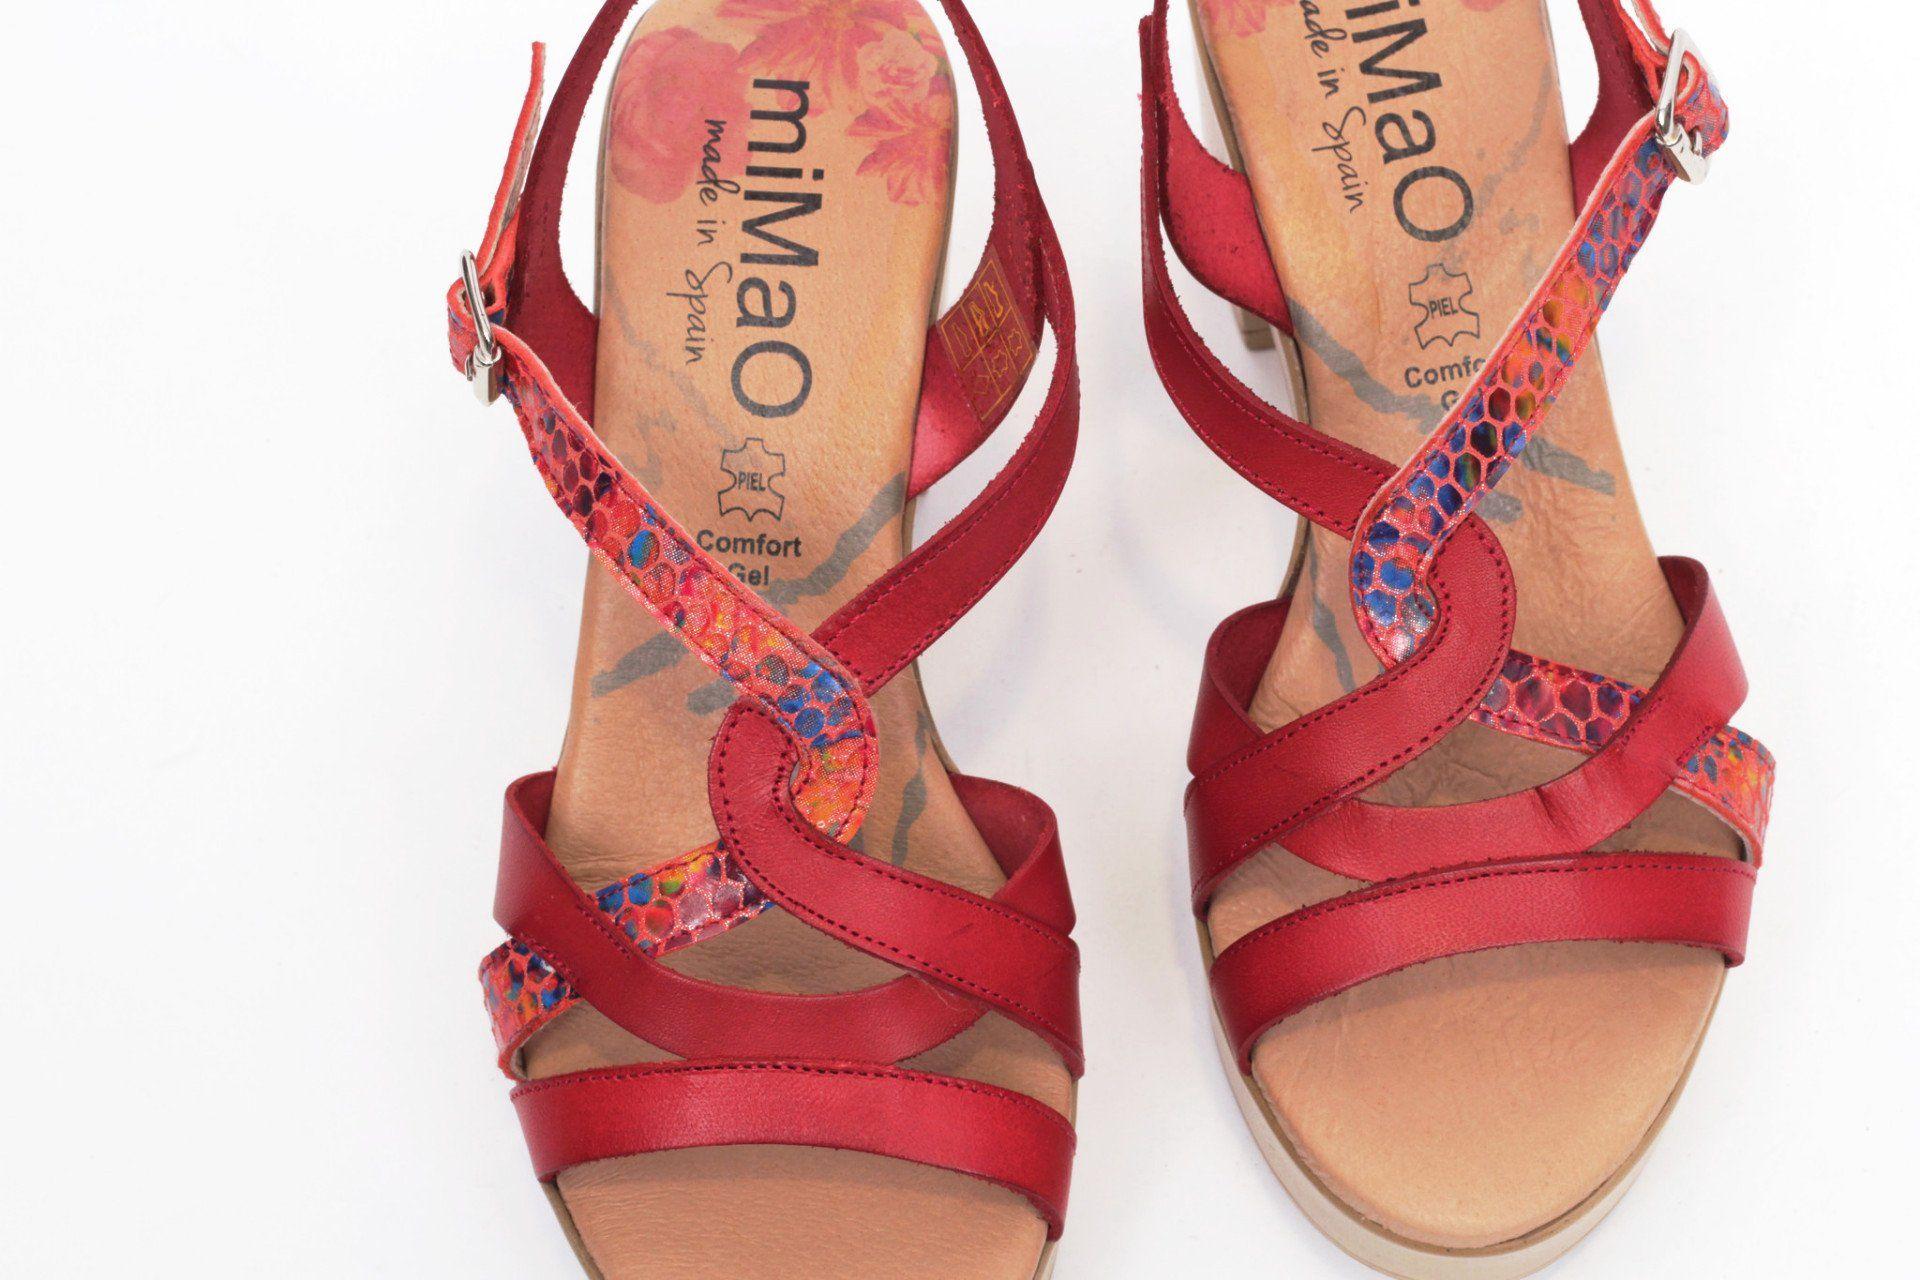 d498a2090f2 miMaO Eivissa Rojo - Sandalias mujer tacón plataforma cómodo piel - Comfort  women s sandals heel platform red leather